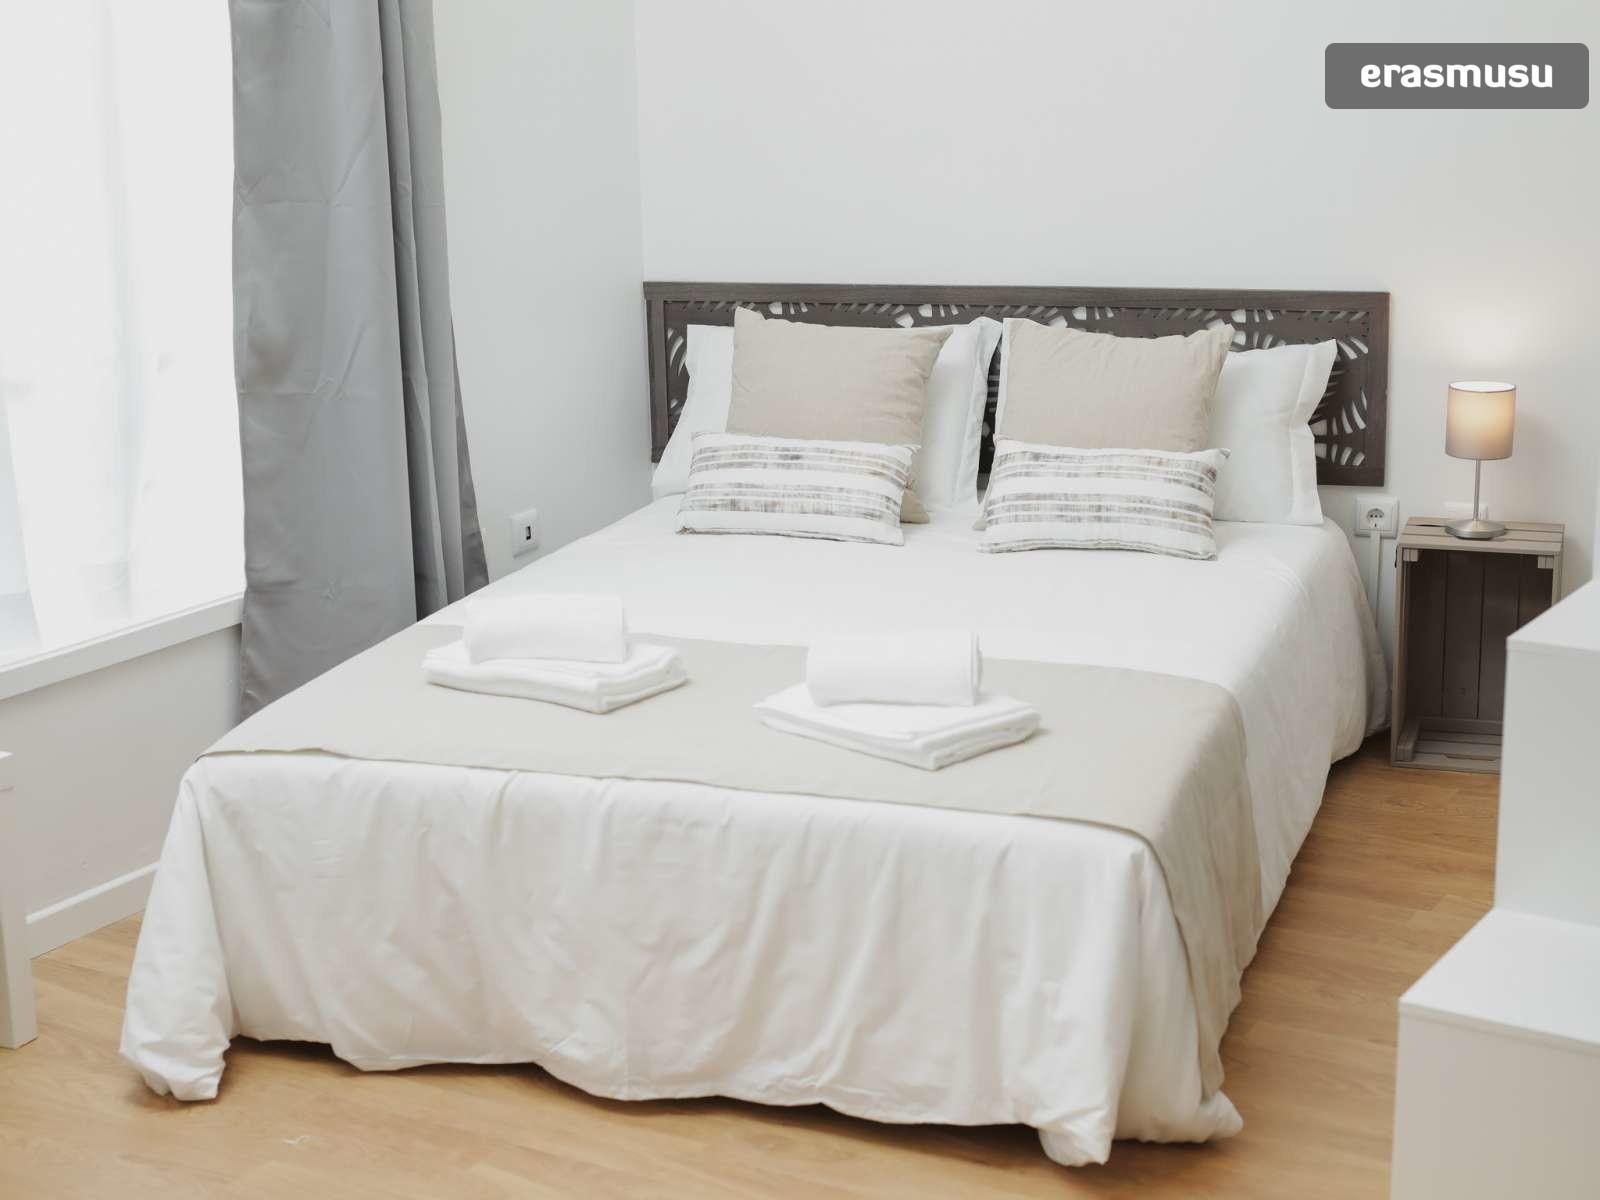 stunning-studio-apartment-rent-santo-ildefonso-5bb80d1200403879e